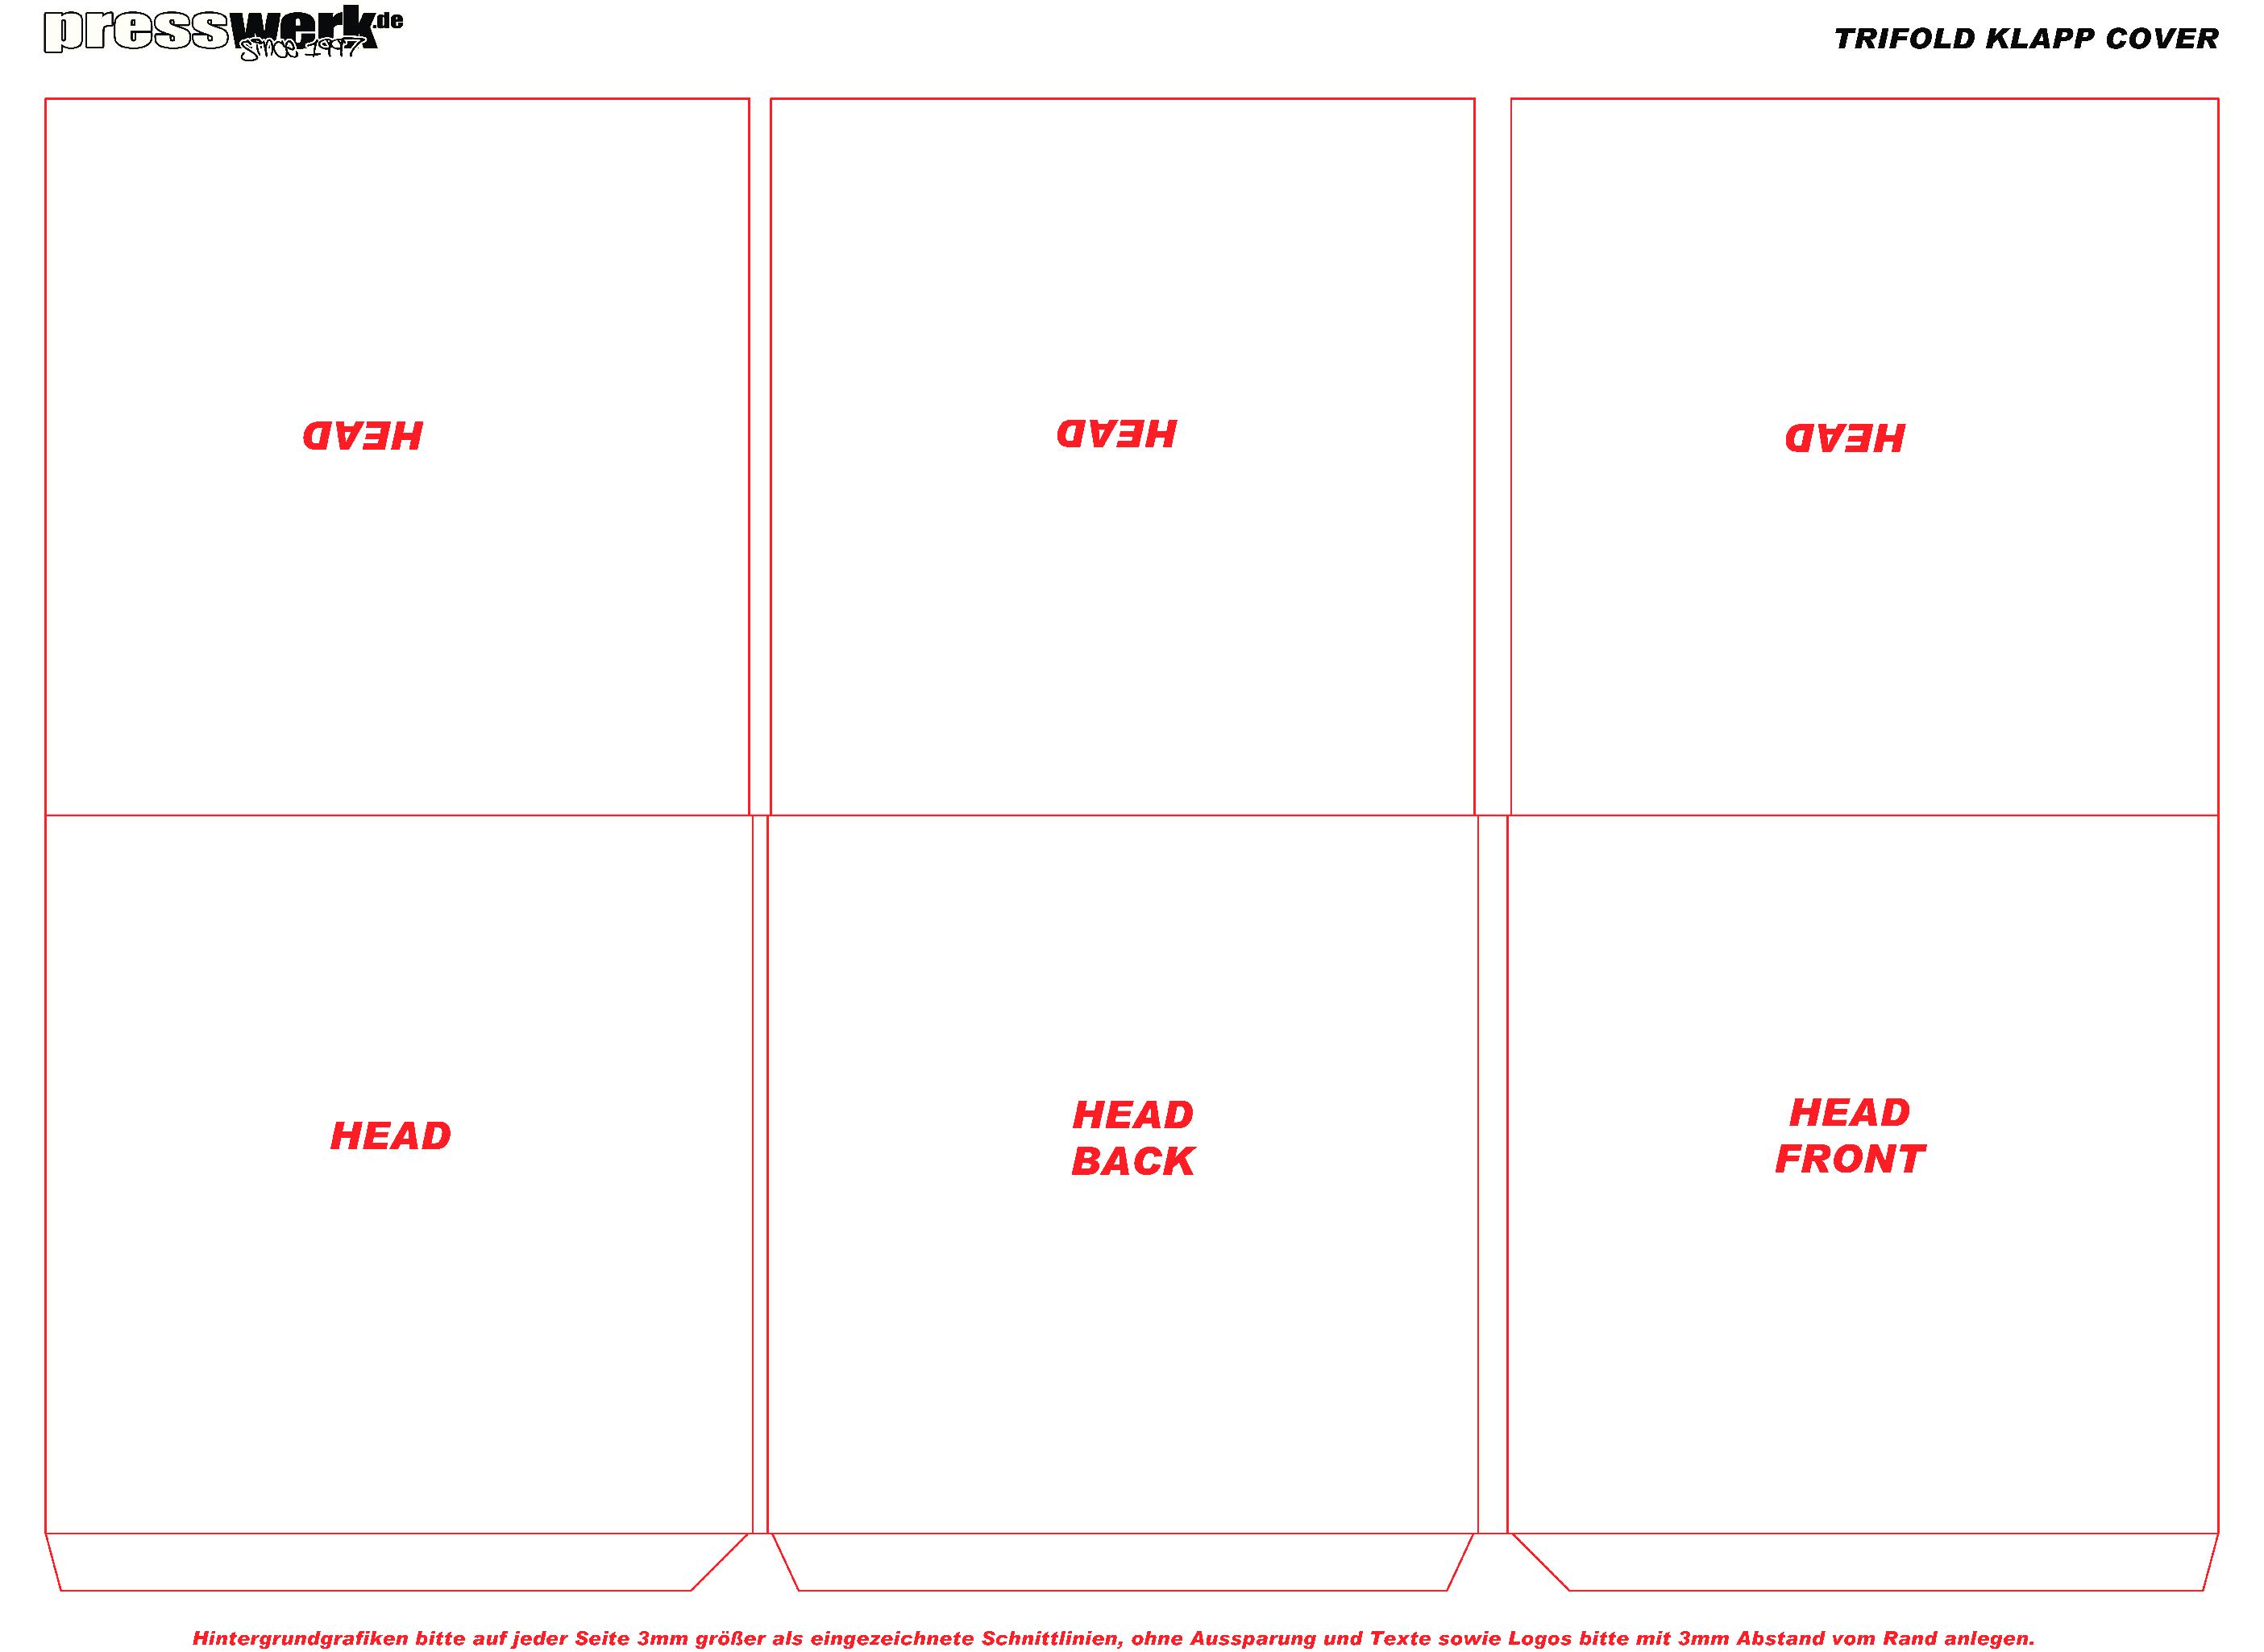 presswerk_de_12-Trifold_Cover_300dpi-CMYK_template.pdf